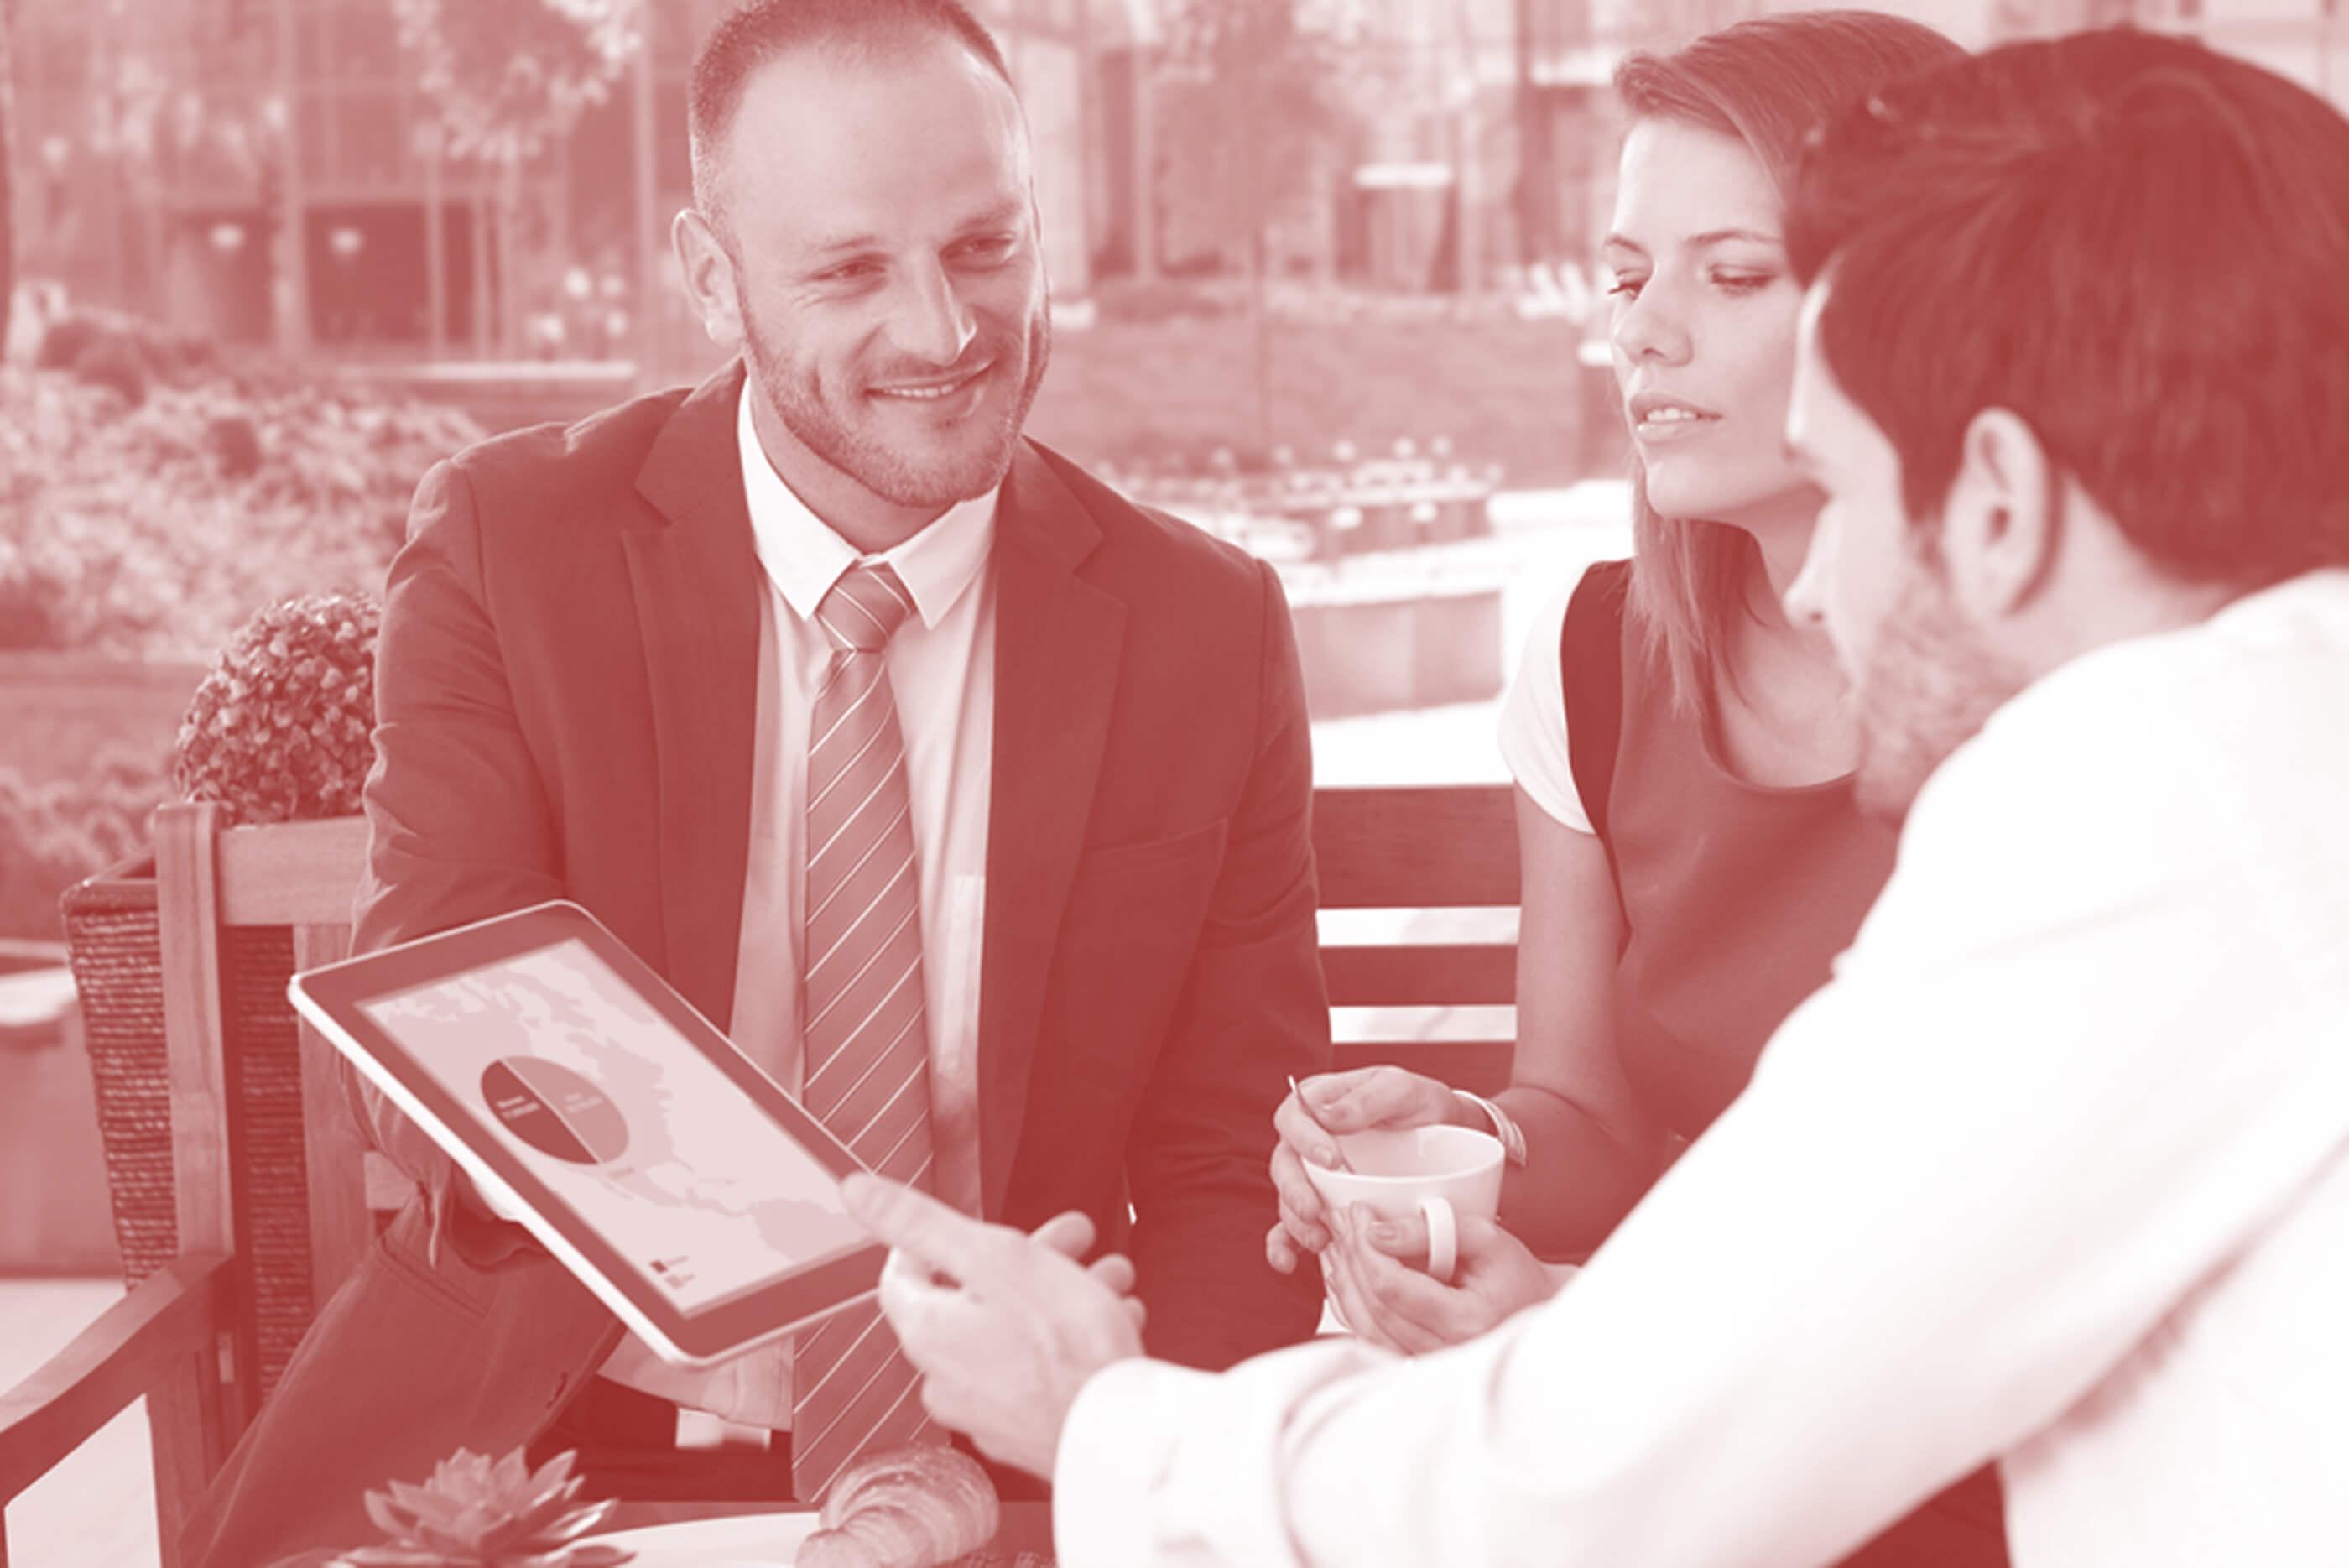 Strategic Adviser for CIO and IT Leadership